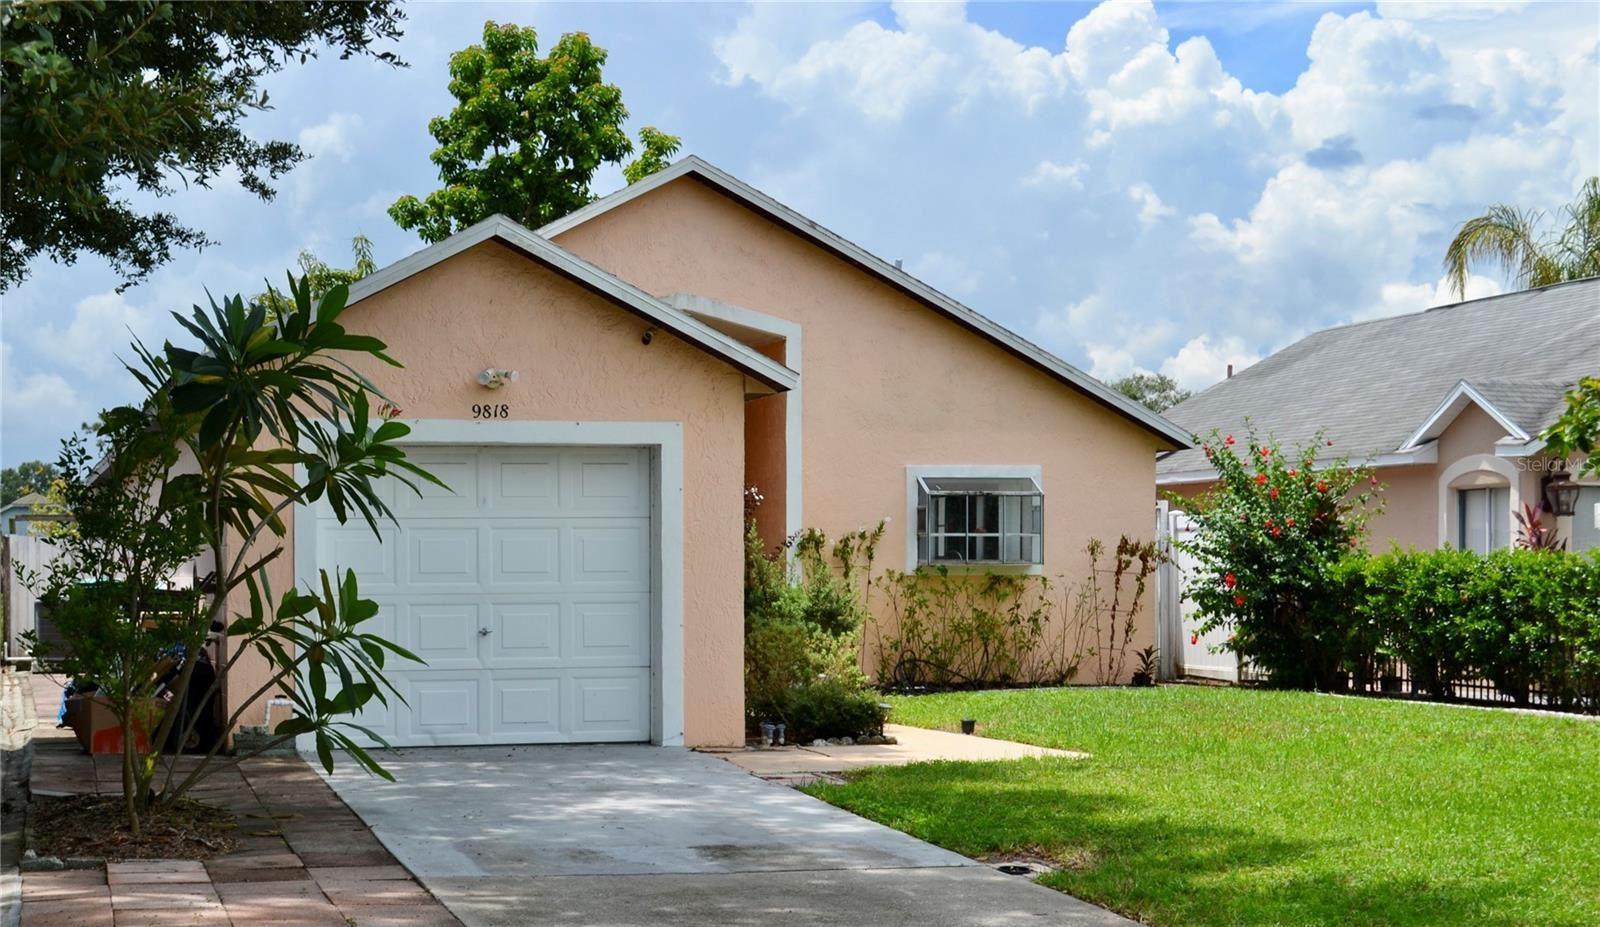 9818 DEAN ACRE DRIVE, Orlando, FL 32825 - MLS#: O5961424